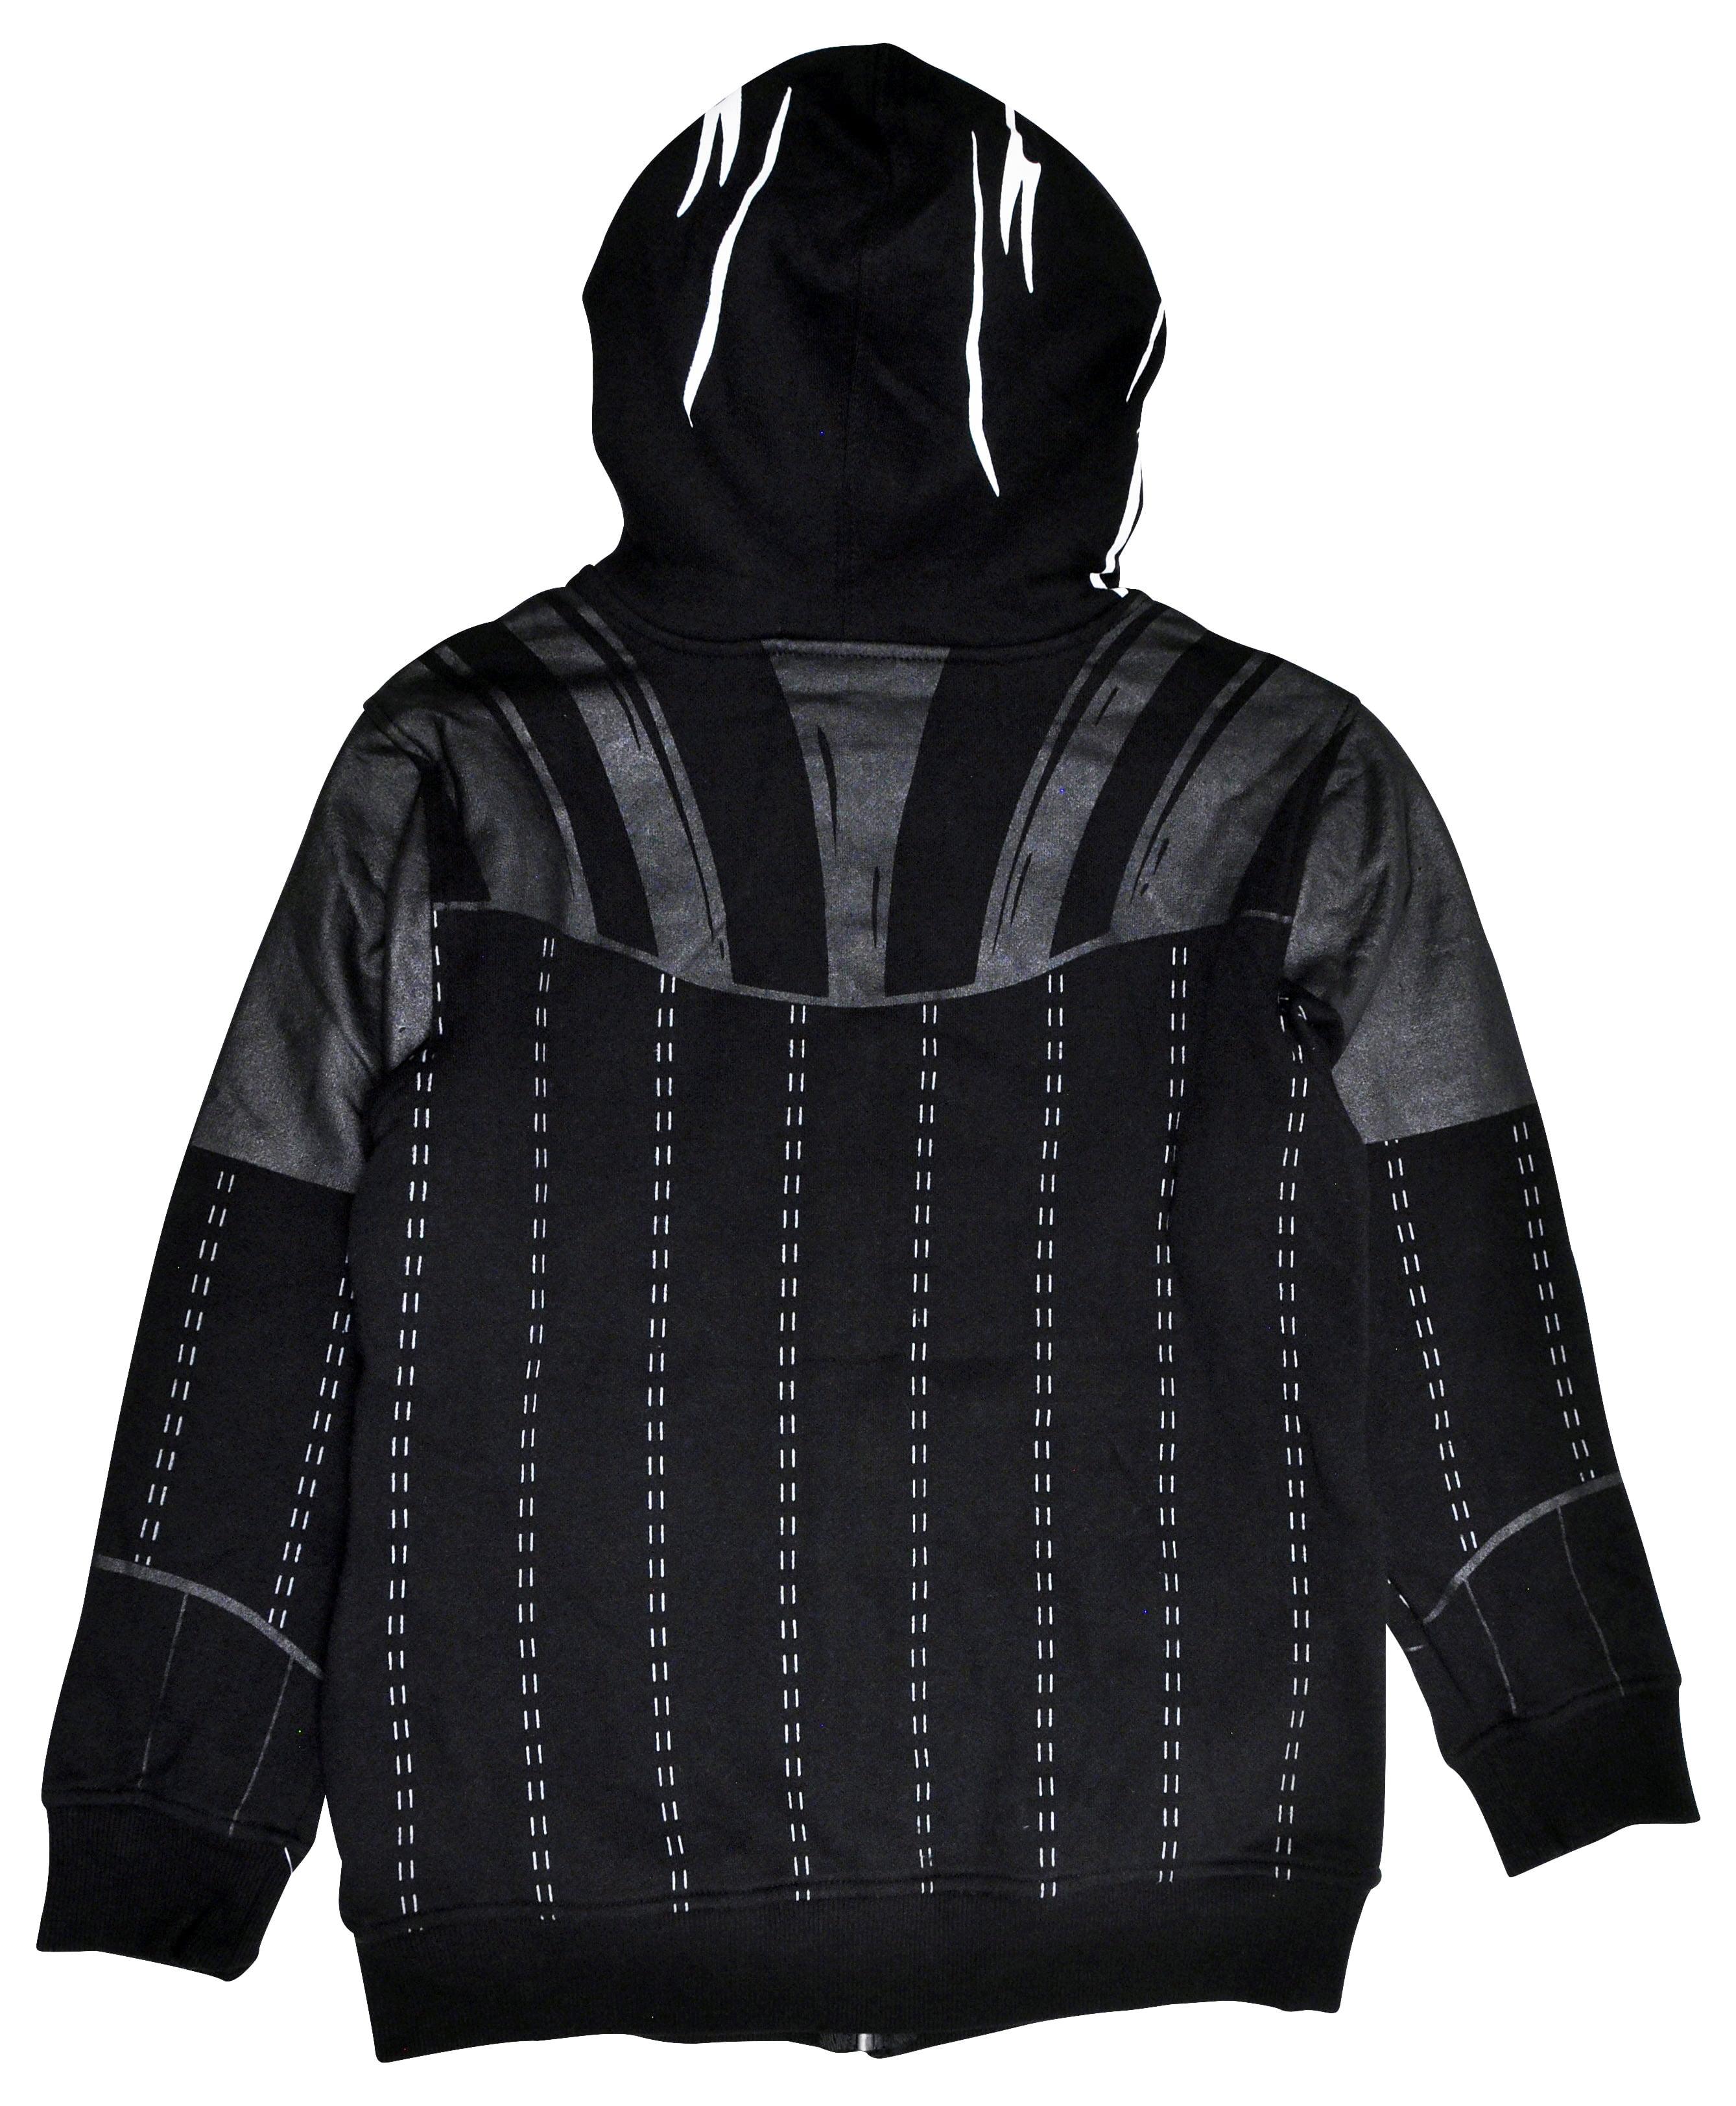 Black Sizes 8-22. Ladies Famous Make Lightweight Hooded Thermal Sweatshirt